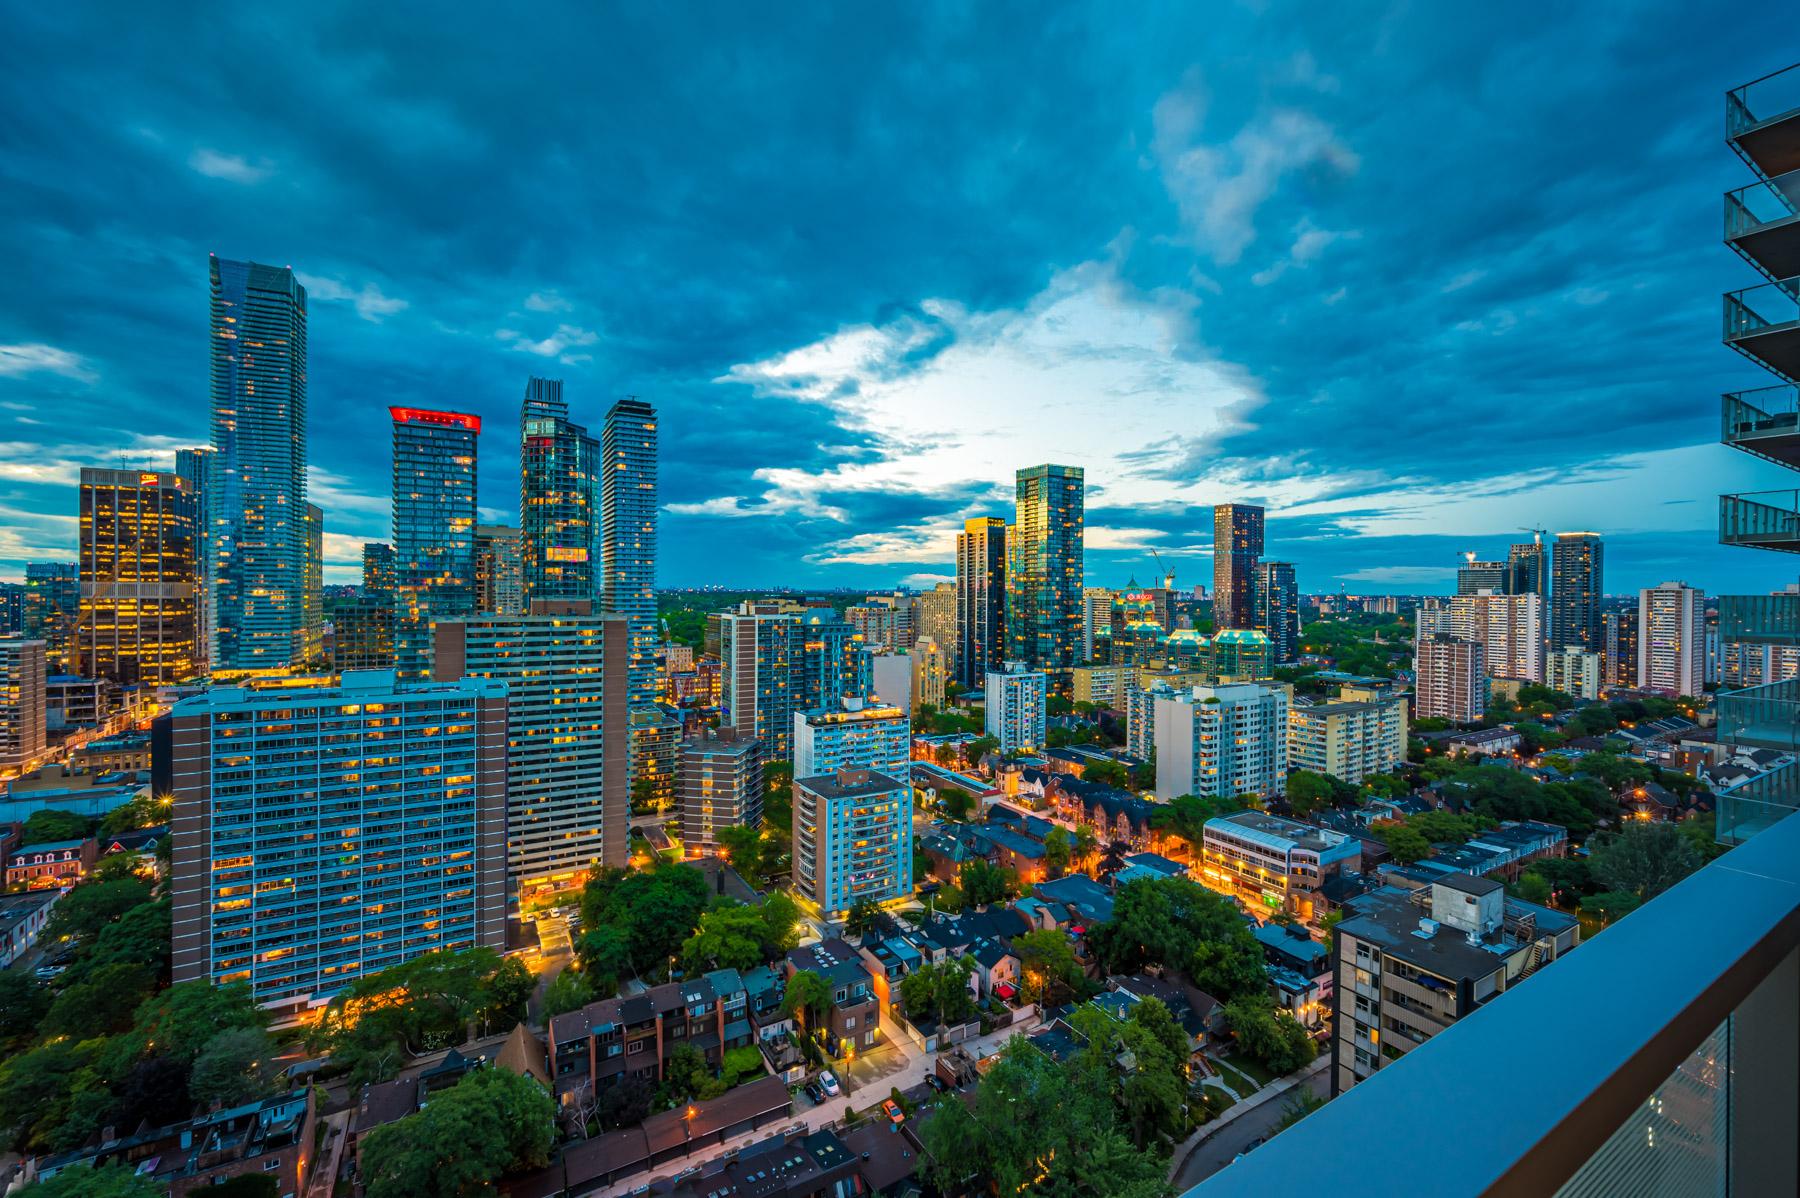 Toronto skyline at night from 28 Wellesley St Unit 3009 balcony.